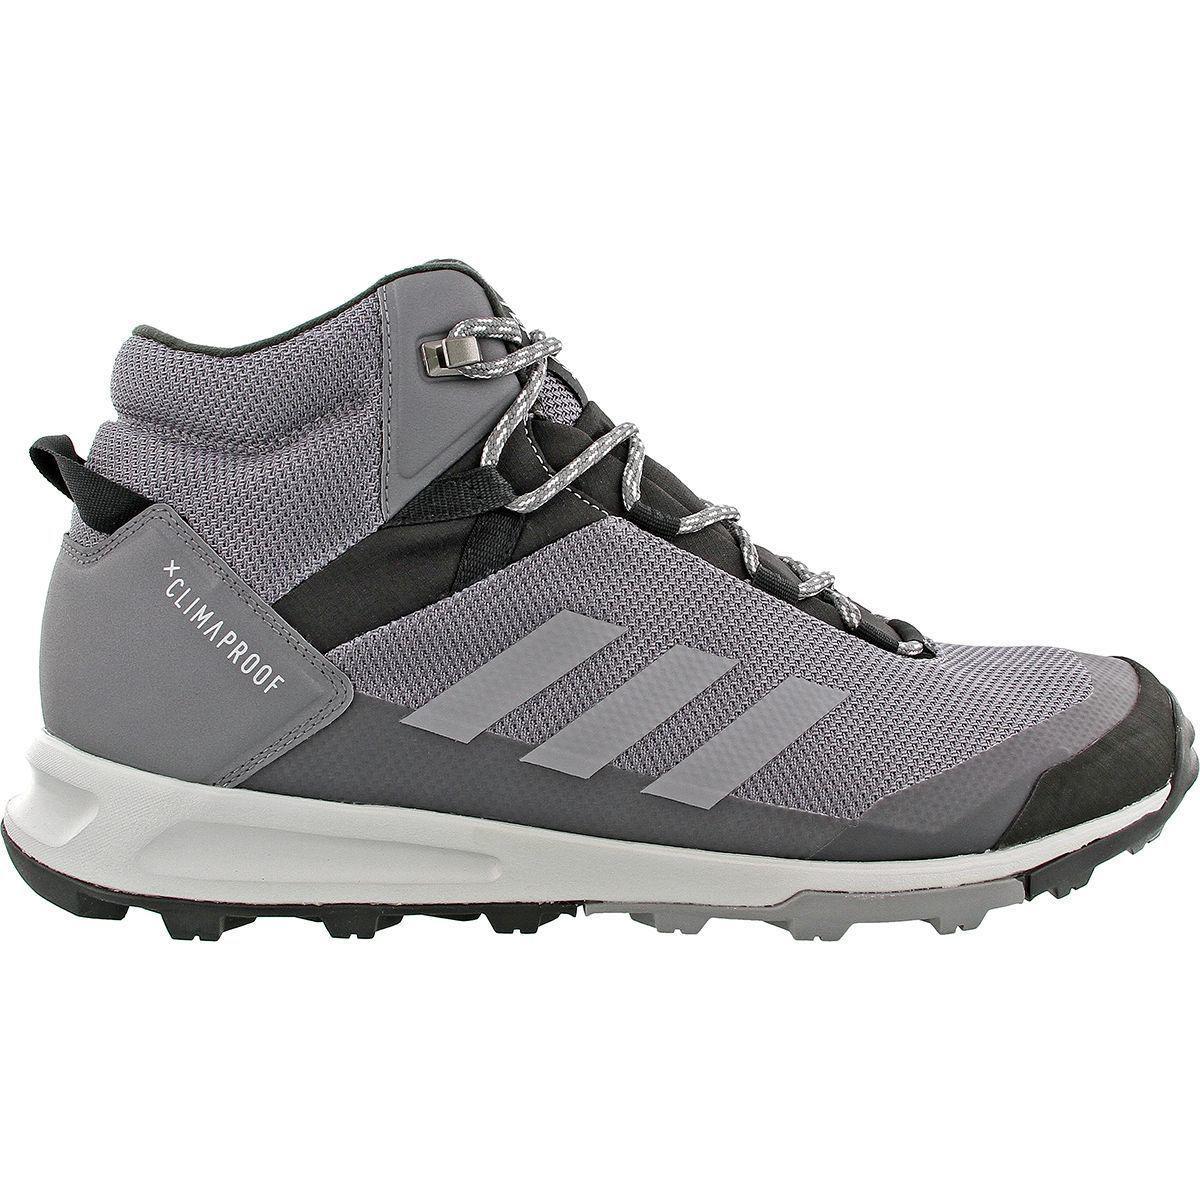 7b7c469140cb Lyst - adidas Originals Terrex Tivid Mid Cp Hiking Shoe in Gray for Men